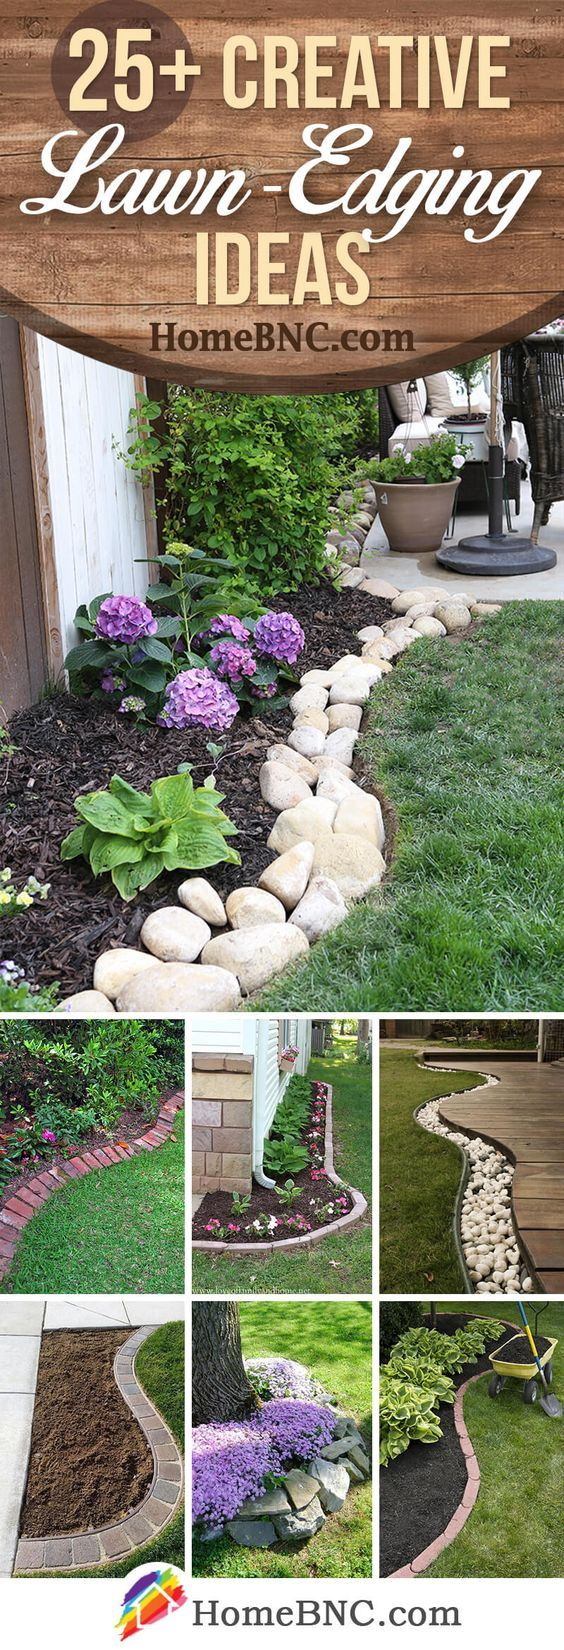 Lawn Edging Ideas Backyard Landscaping Front Yard 400 x 300